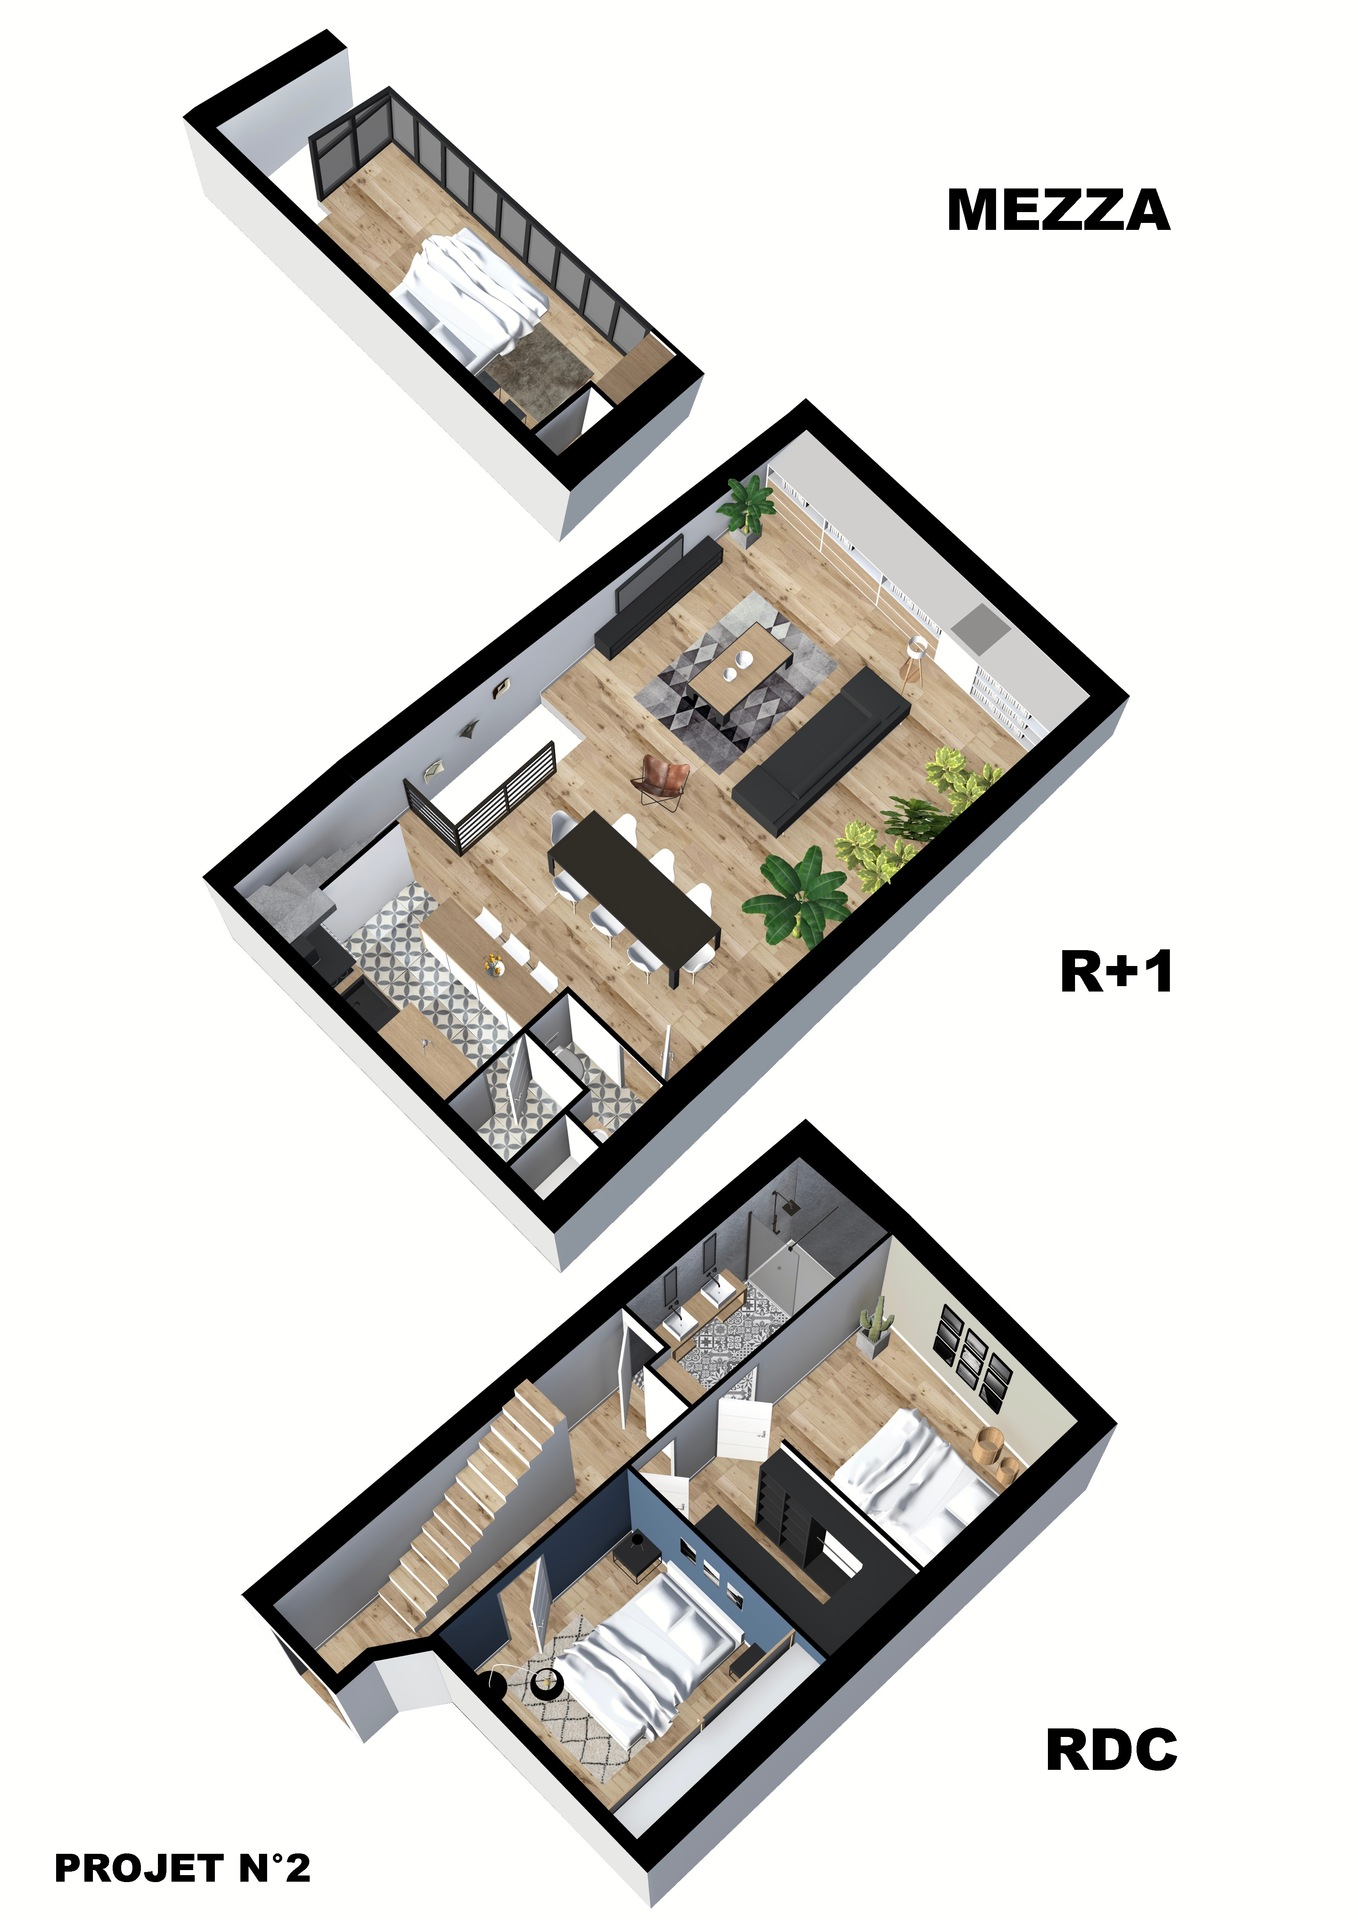 Vente appartement duplex Antibes 06600 T4 90m²_projet 2